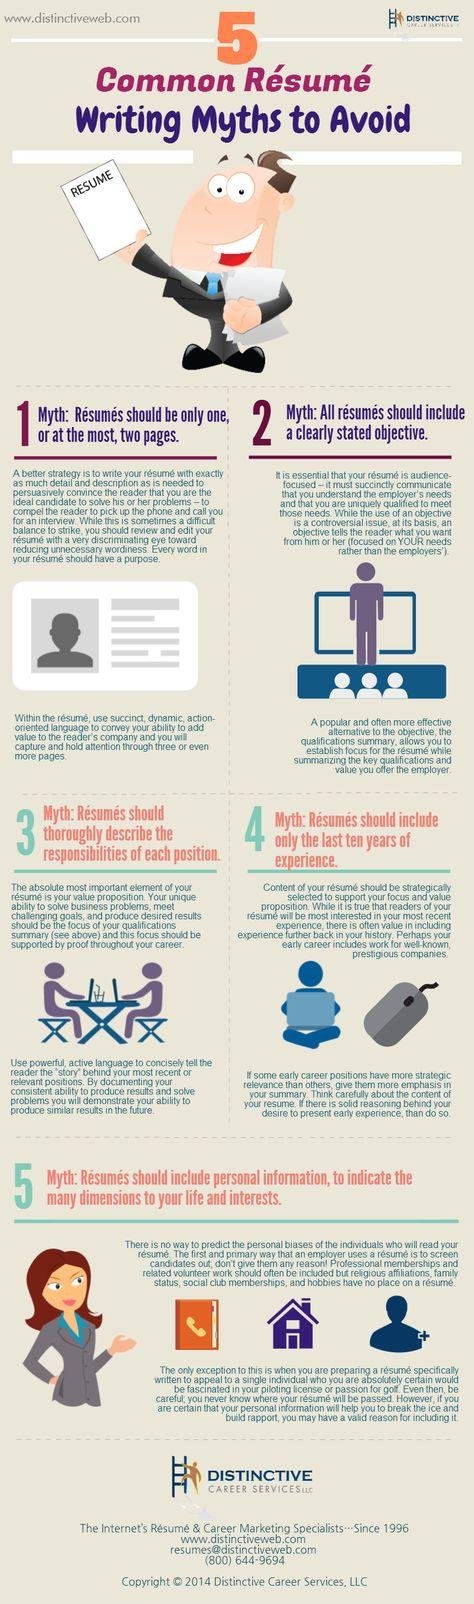 How To Craft a Powerful Resume Summary Statementu2013 Brooklyn Resume - interests on resume